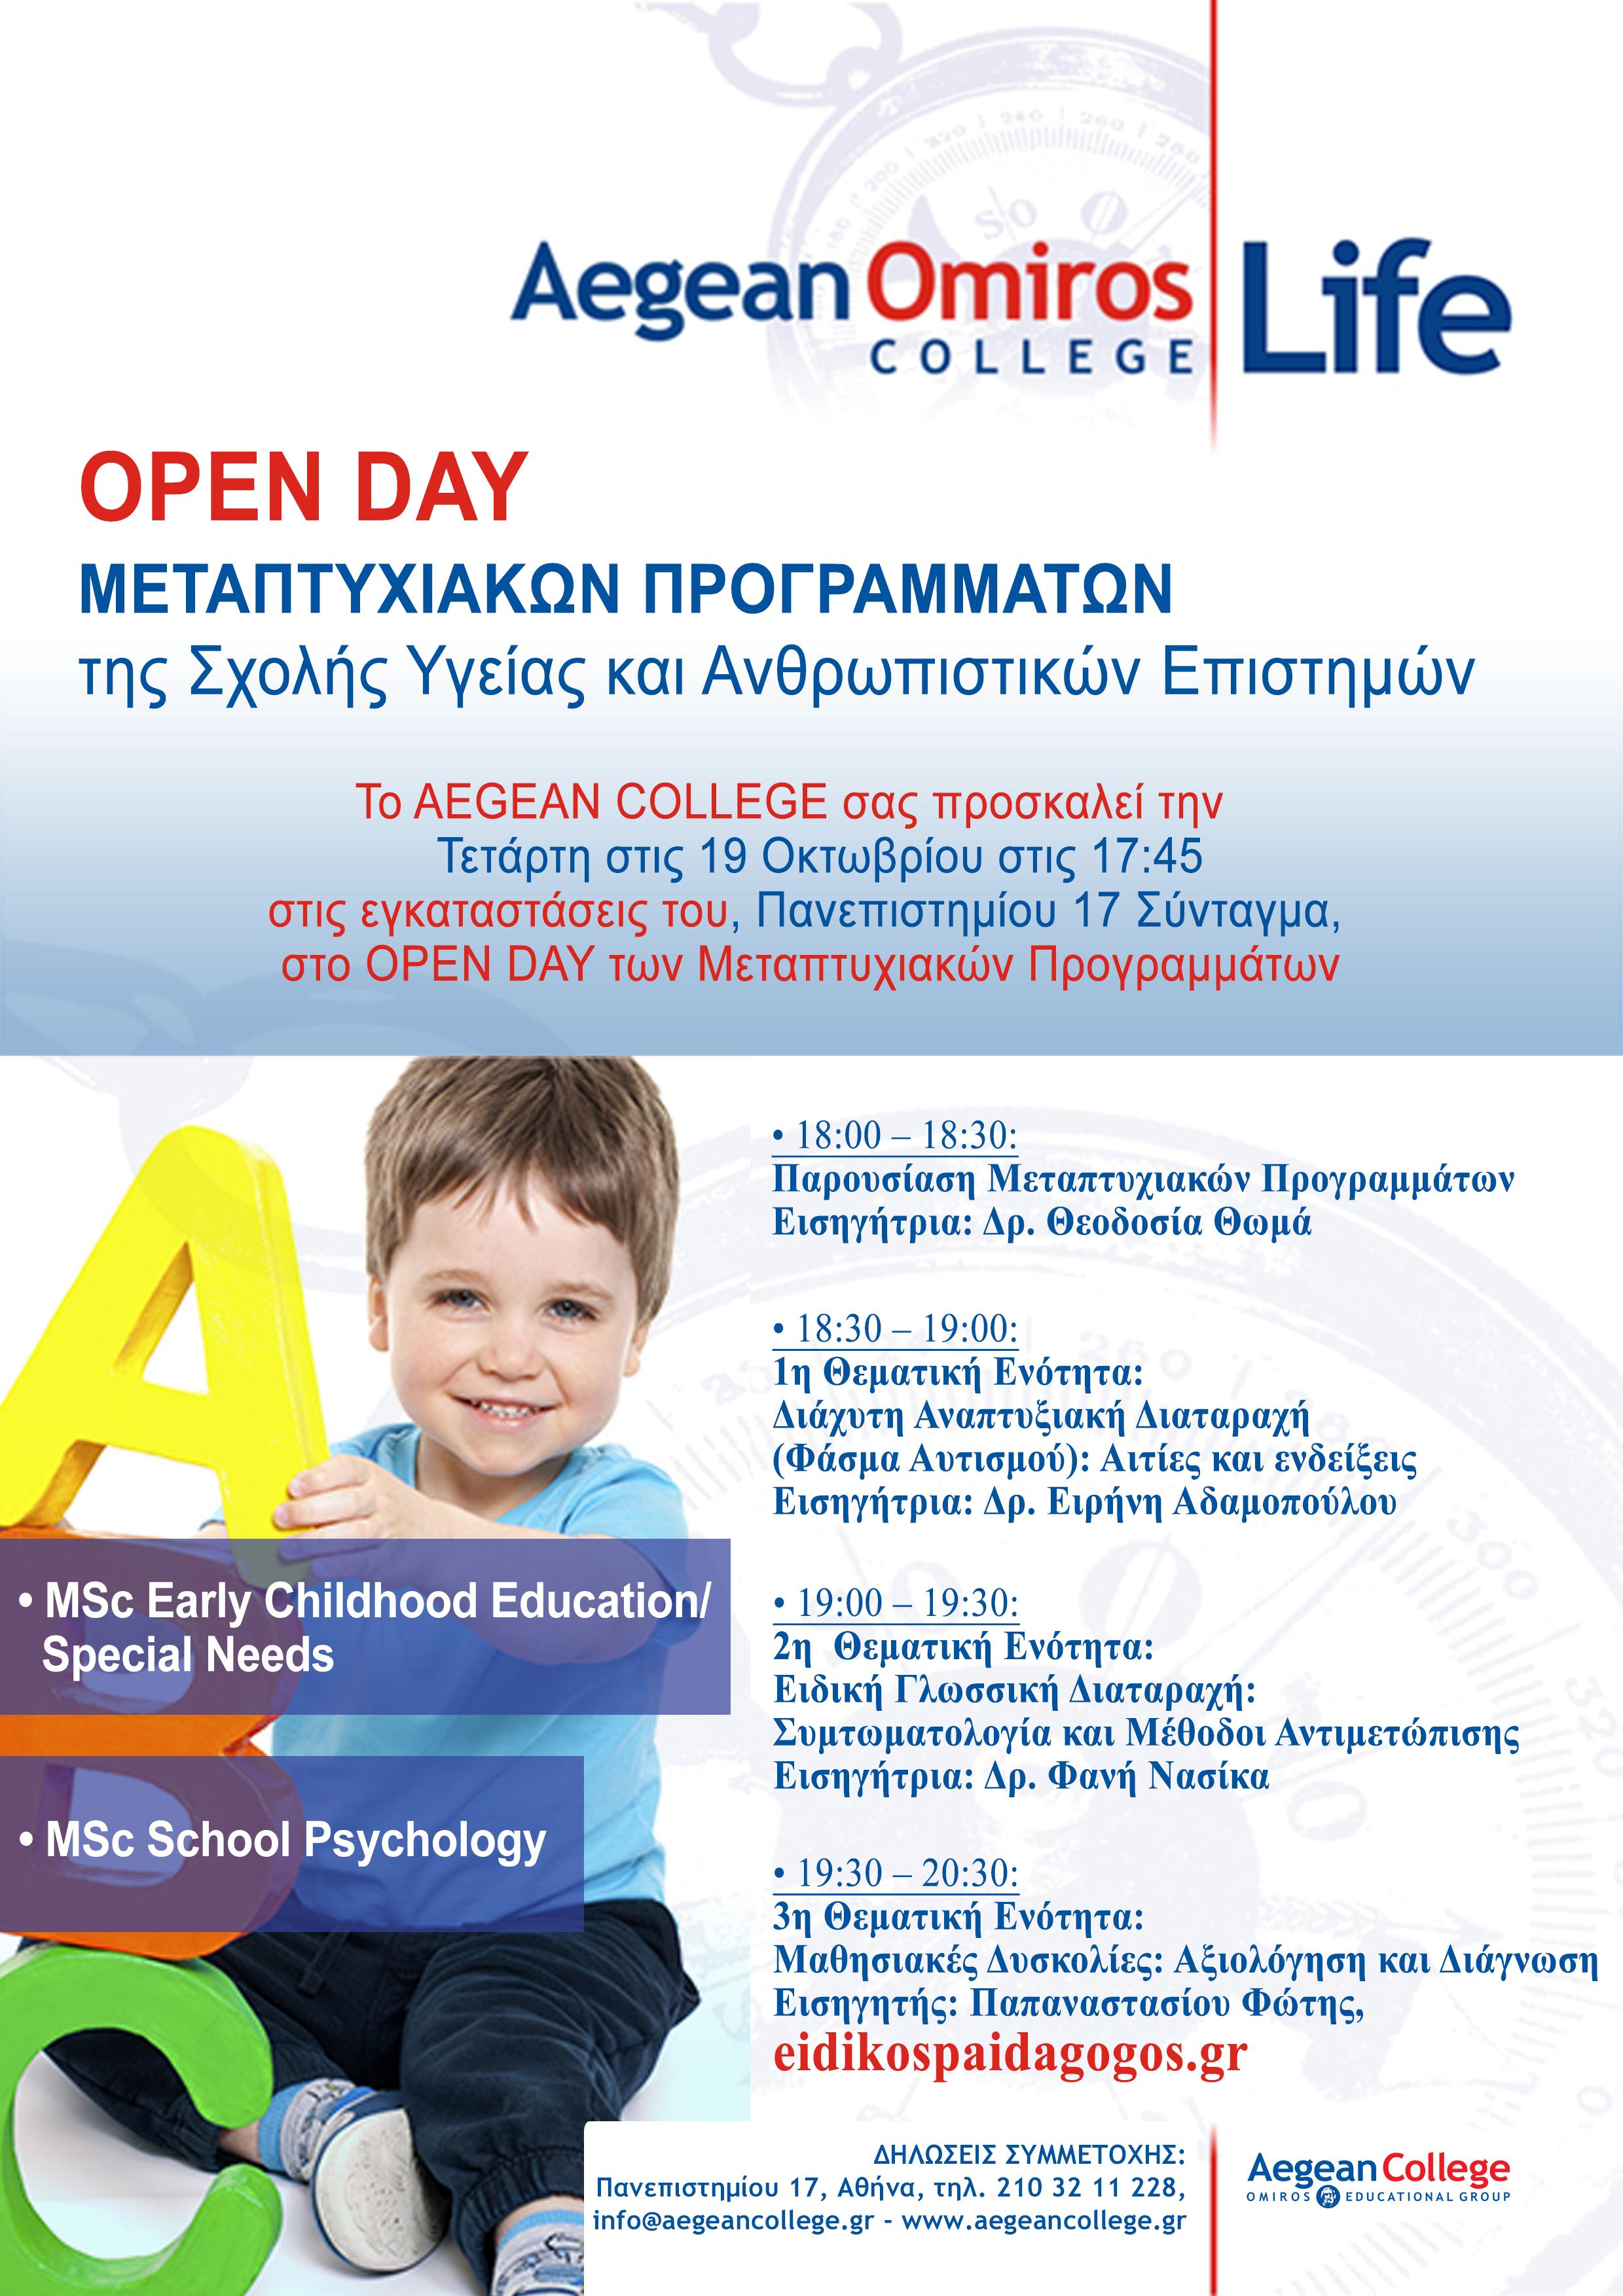 Open Day Μεταπτυχιακών Προγραμμάτων Σχολής Υγείας και Ανθρωπιστικών Επιστήμων